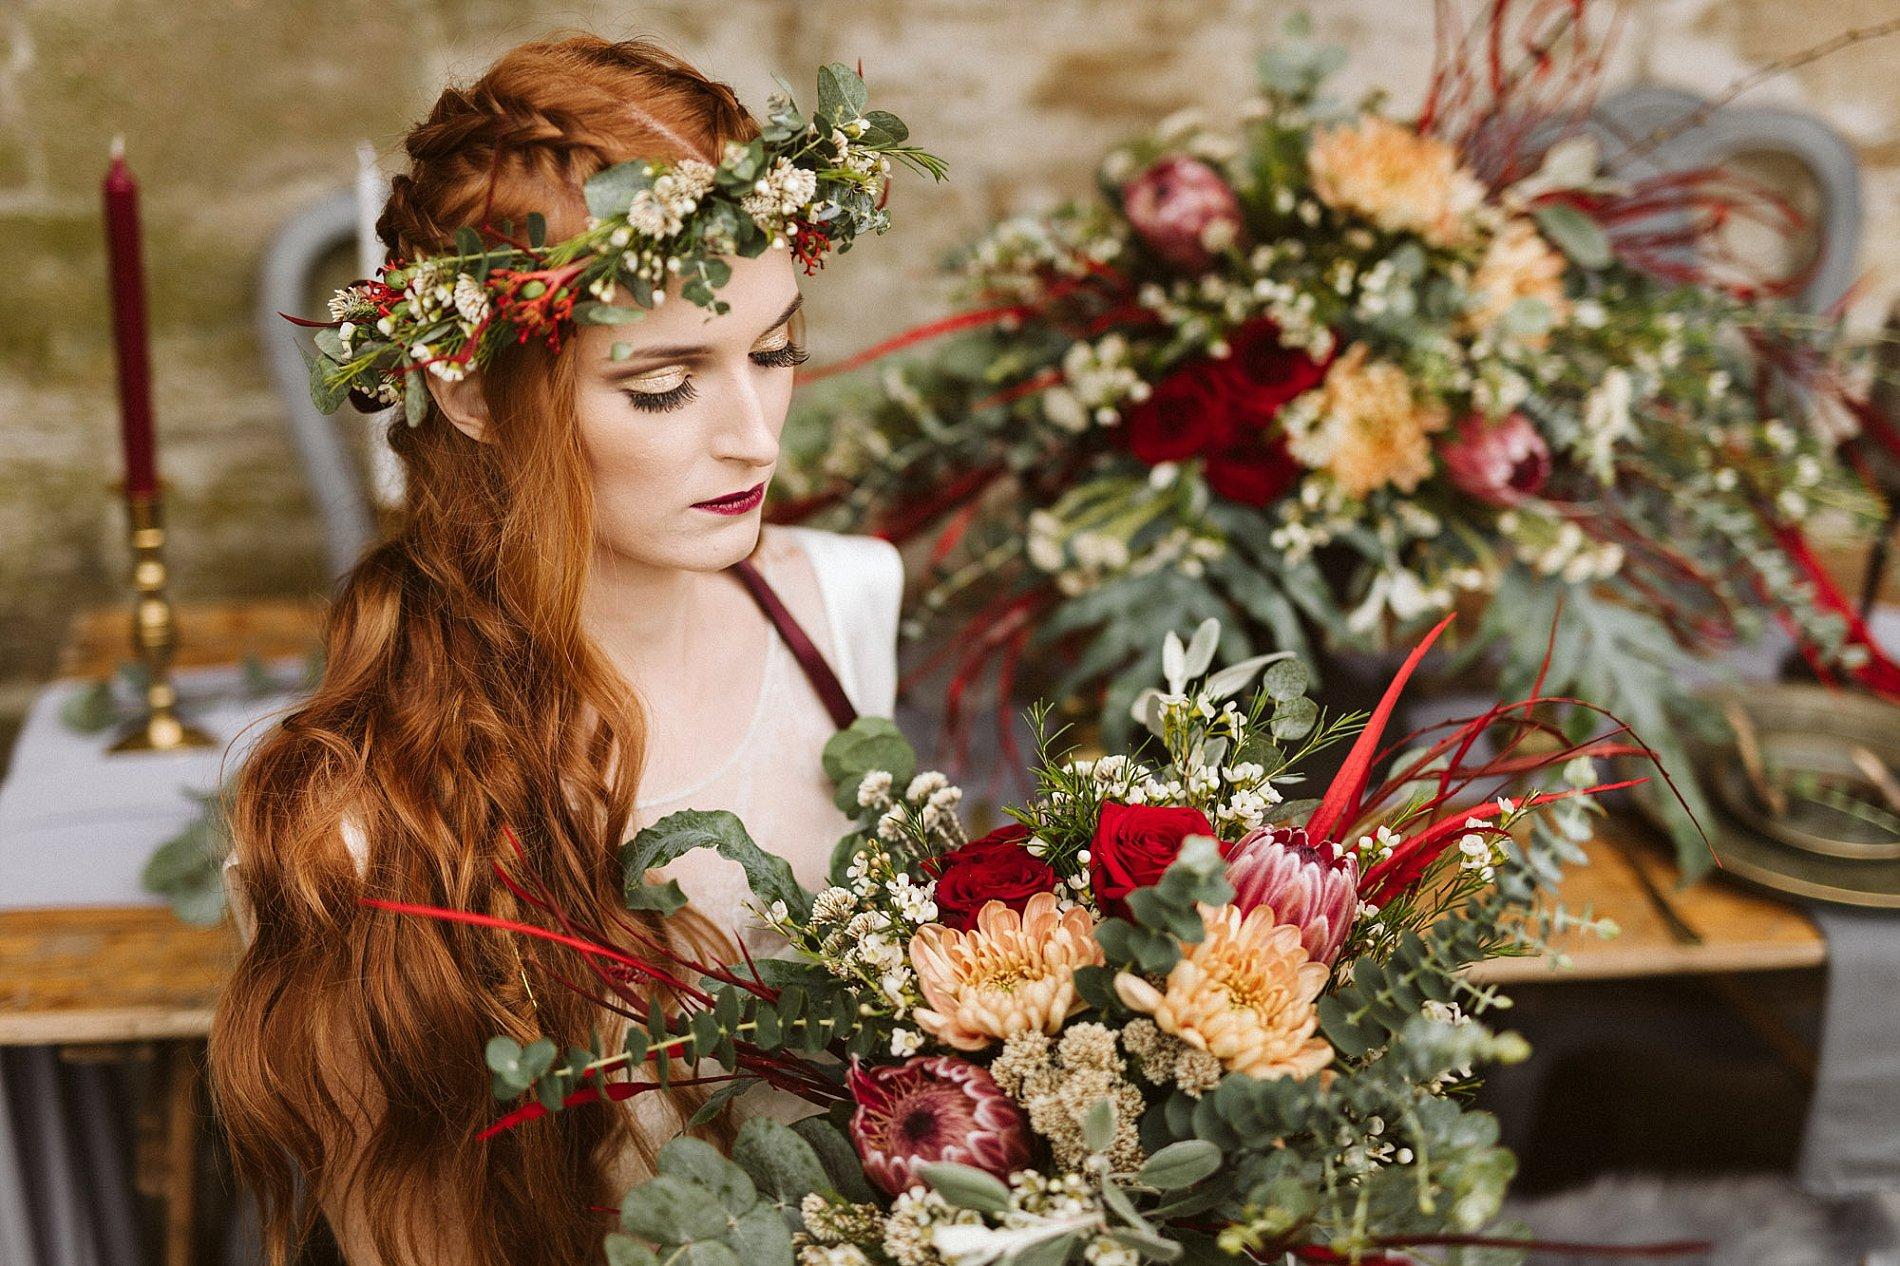 Game of Thrones Creative Bridal Shoot (c) Freya Raby (14)